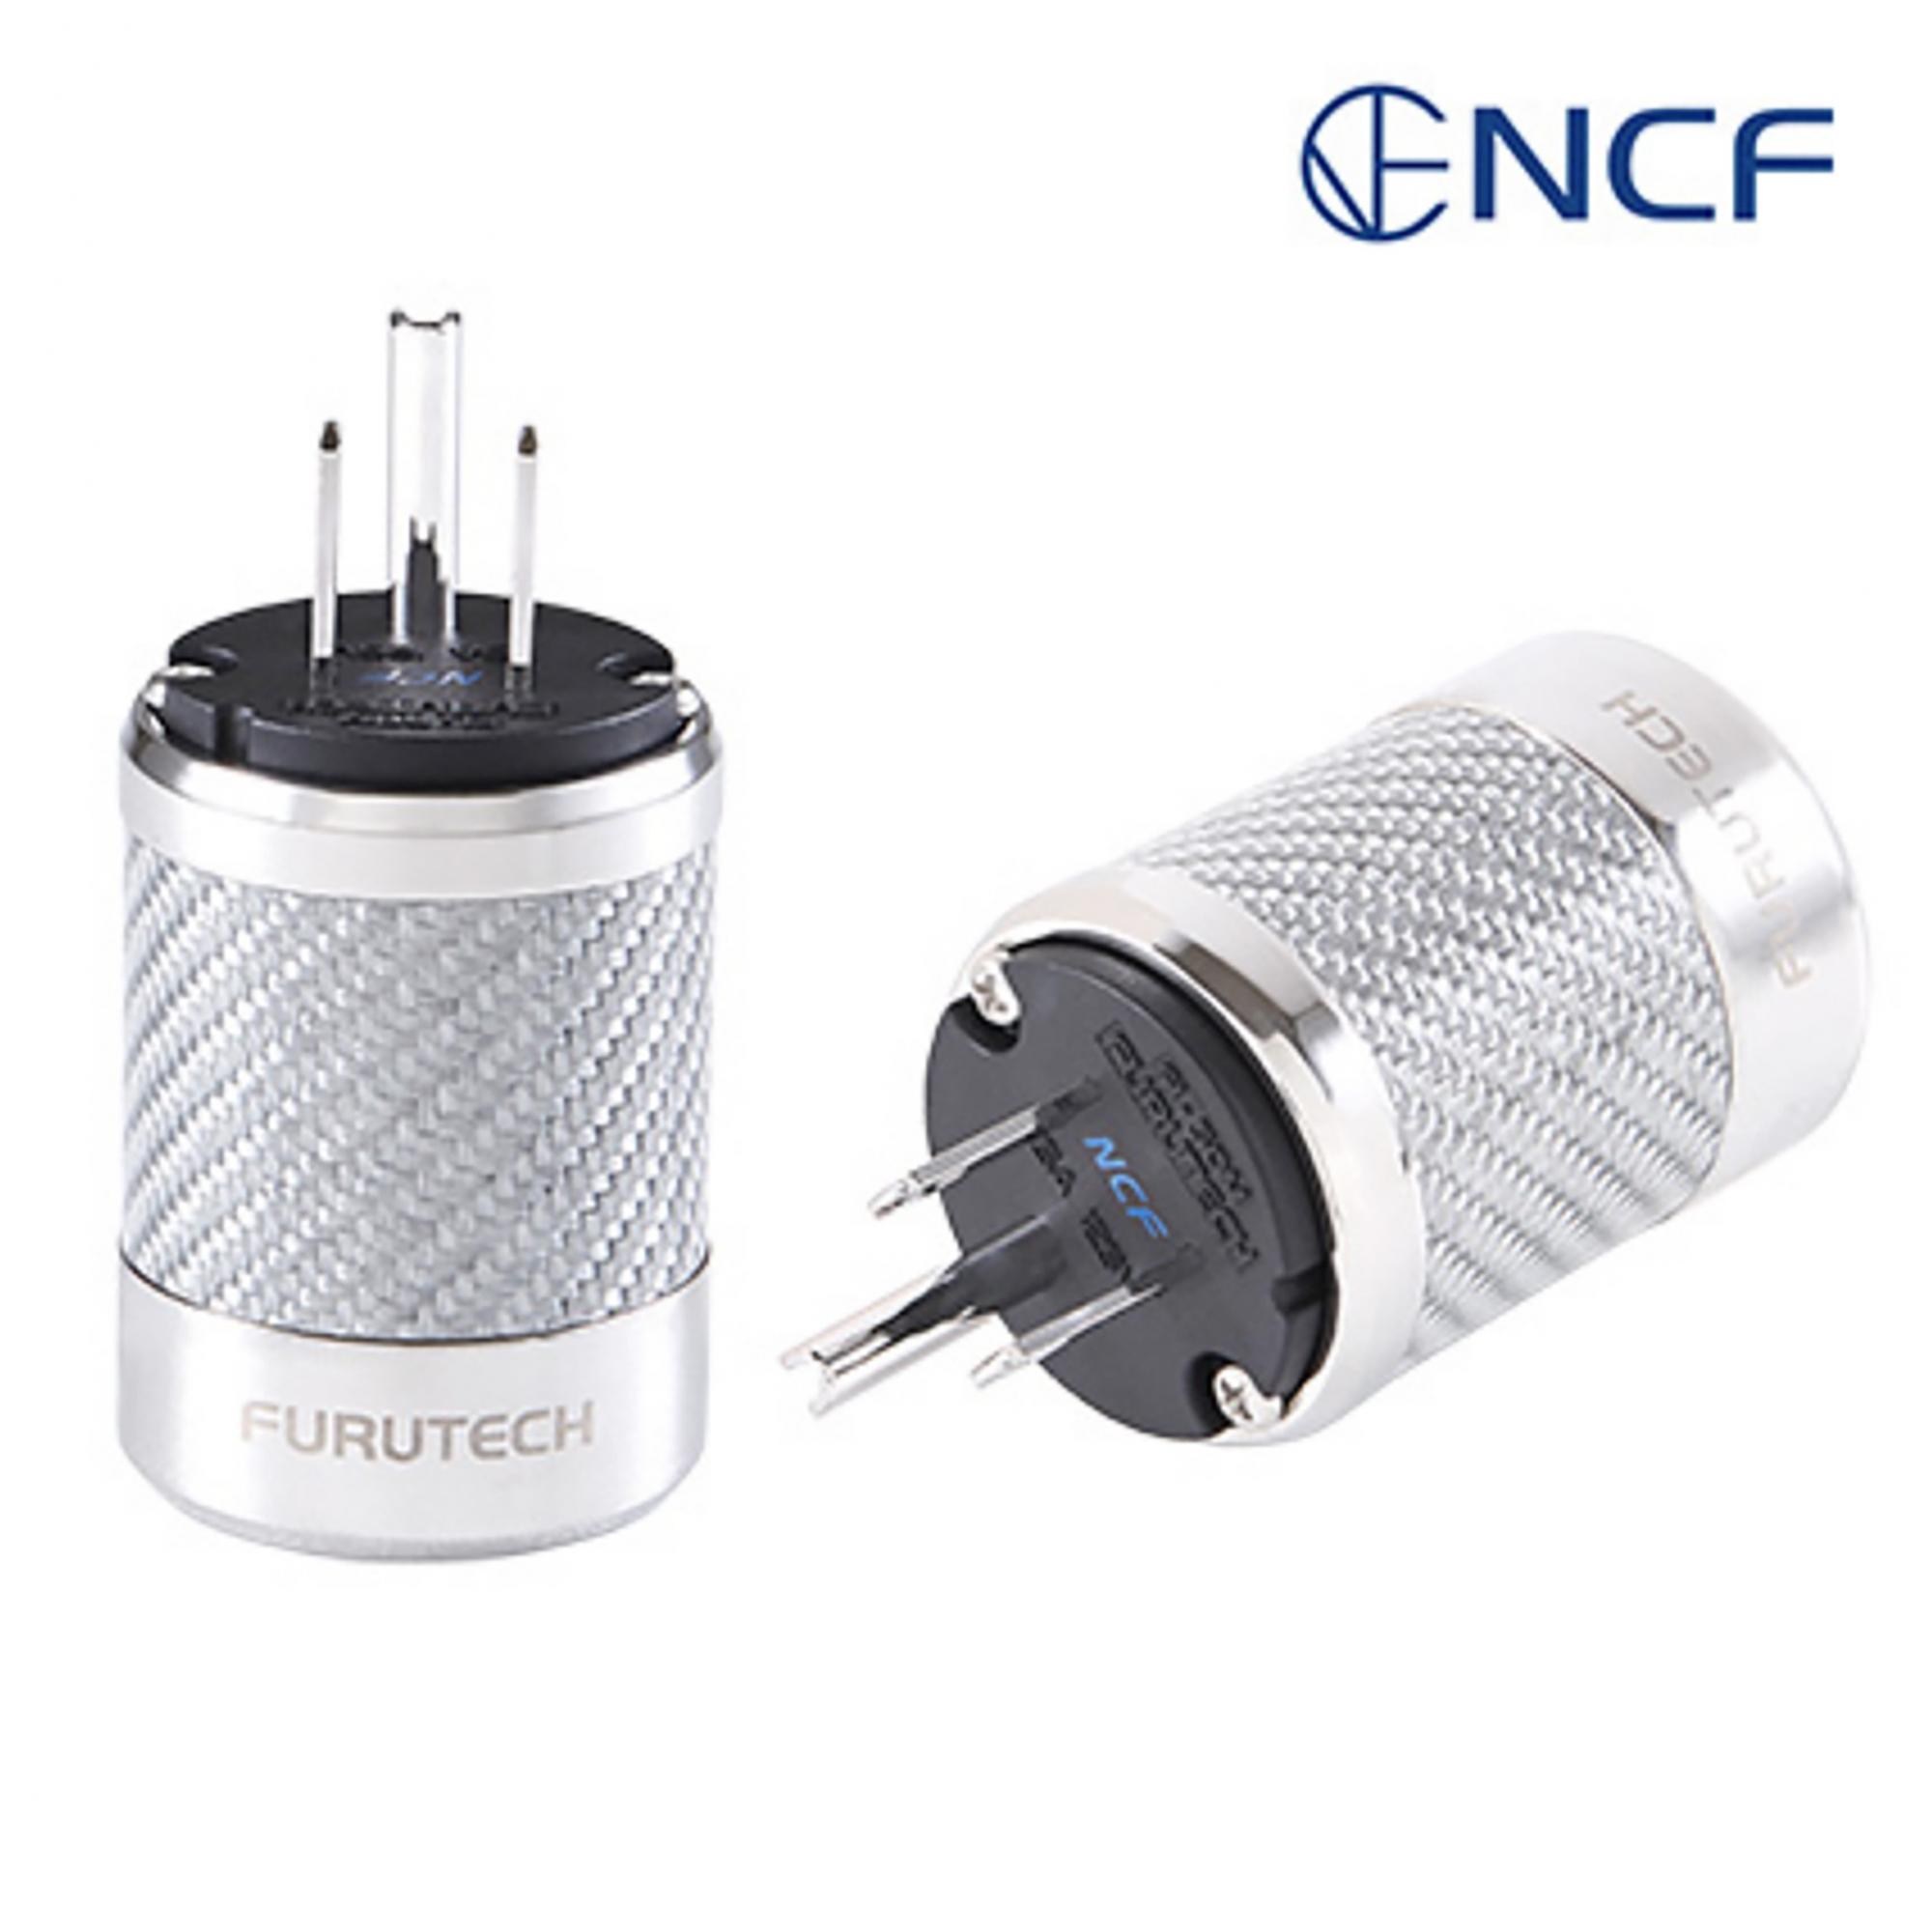 Conector Furutech Fl-50M NCF(R)